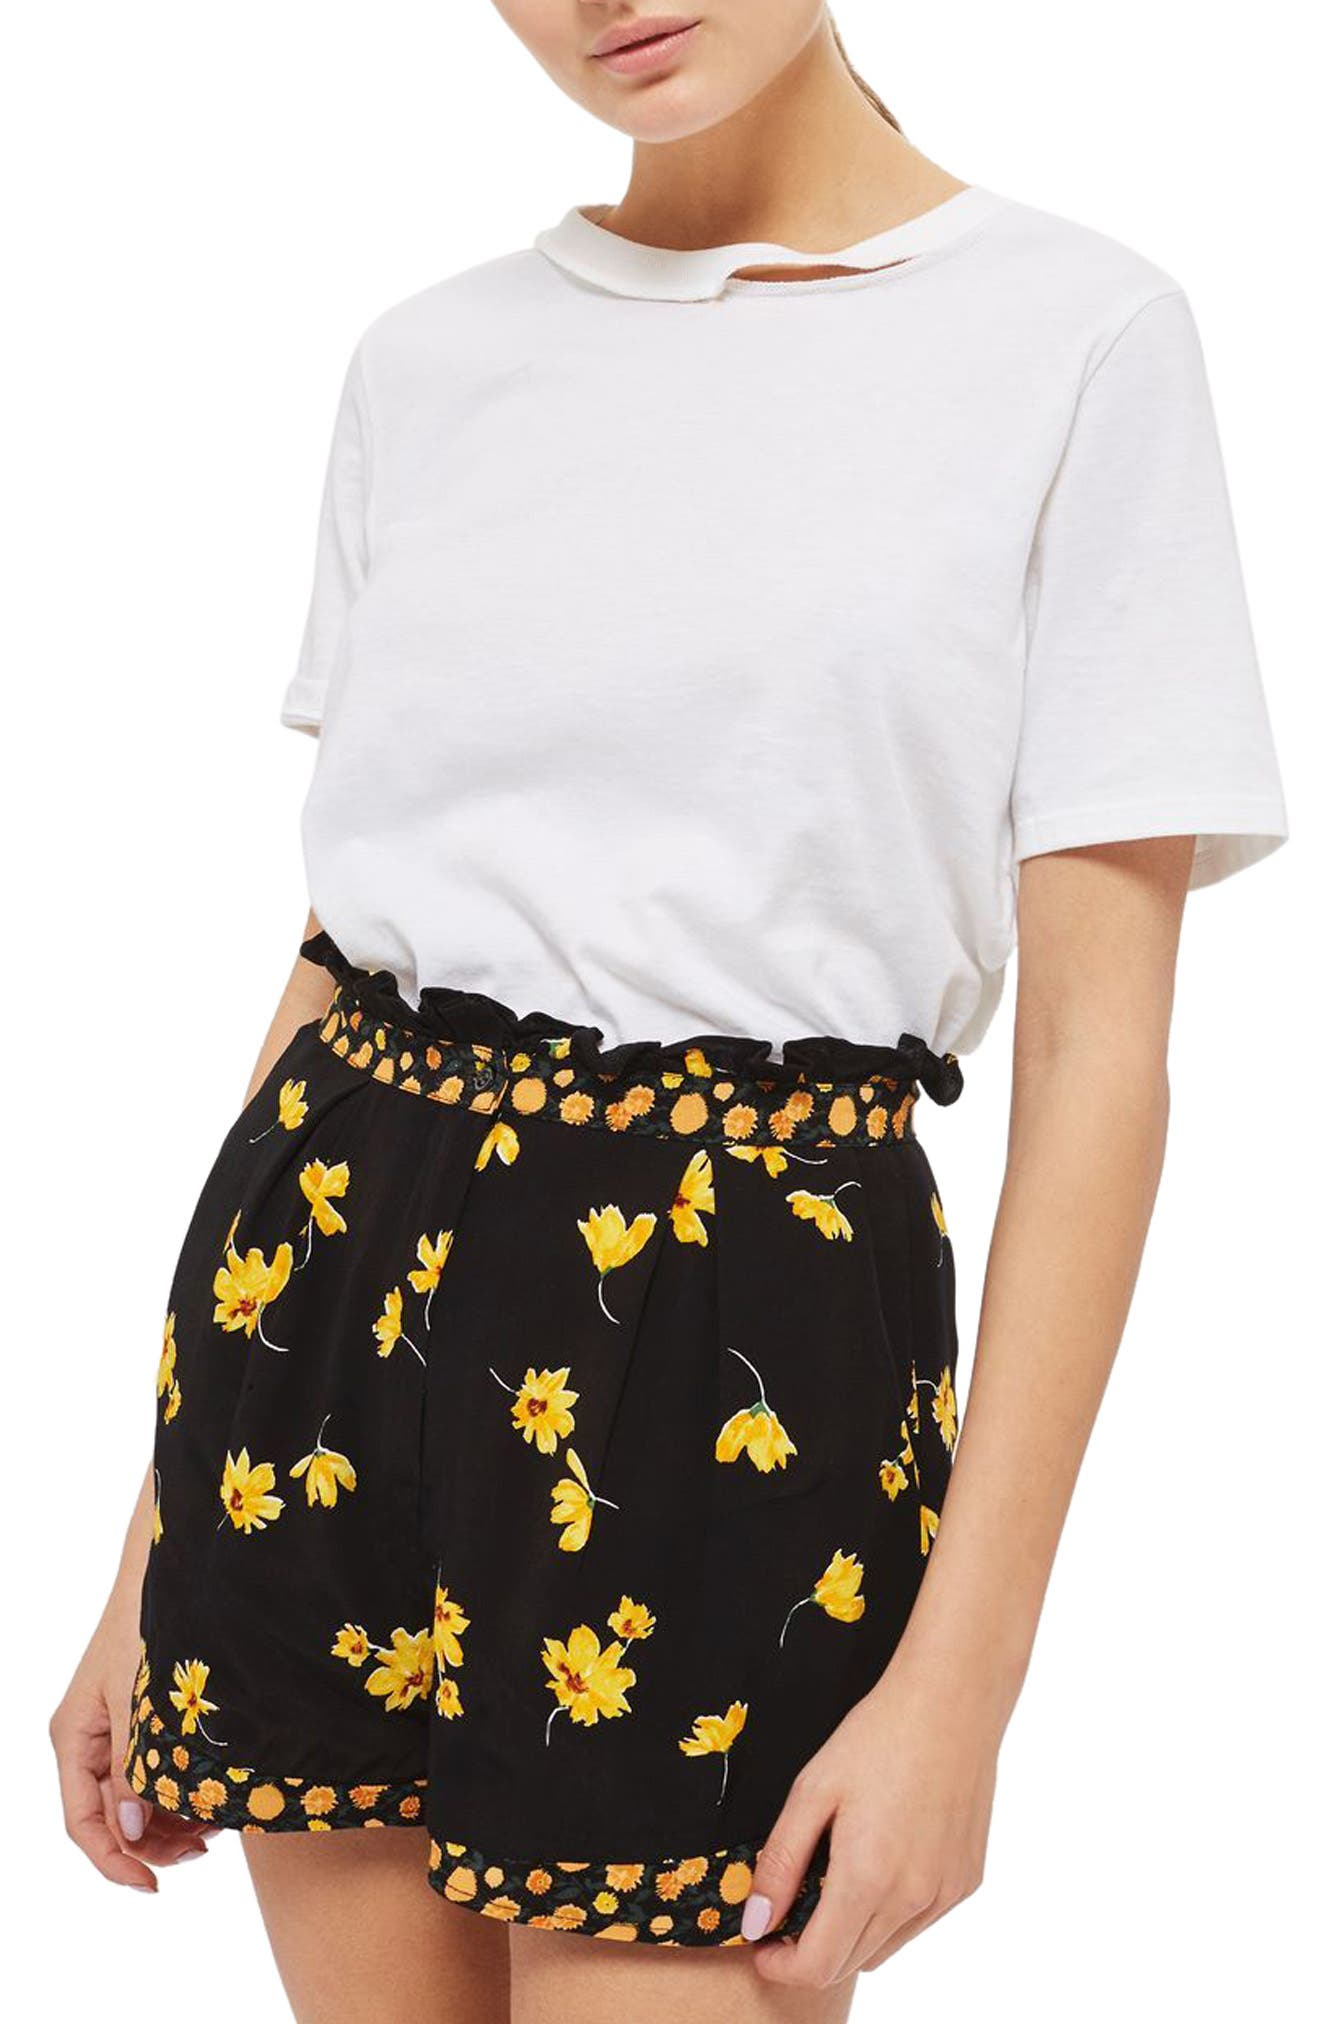 Topshop Floral Shorts (Regular & Petite)